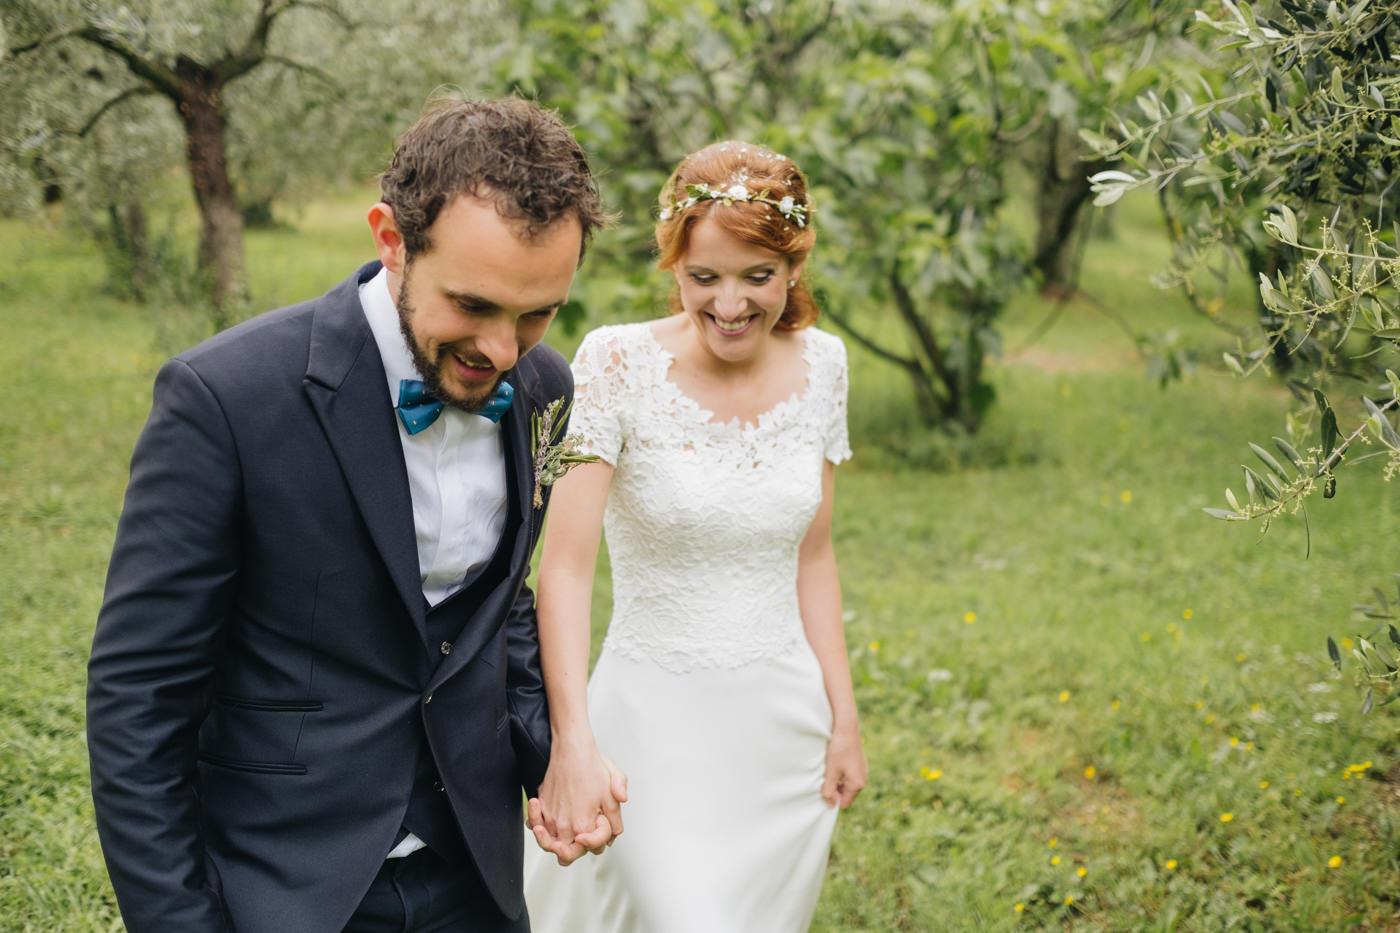 matrimoni_all_italiana_fotografo_matrimonio_toscana-61.jpg